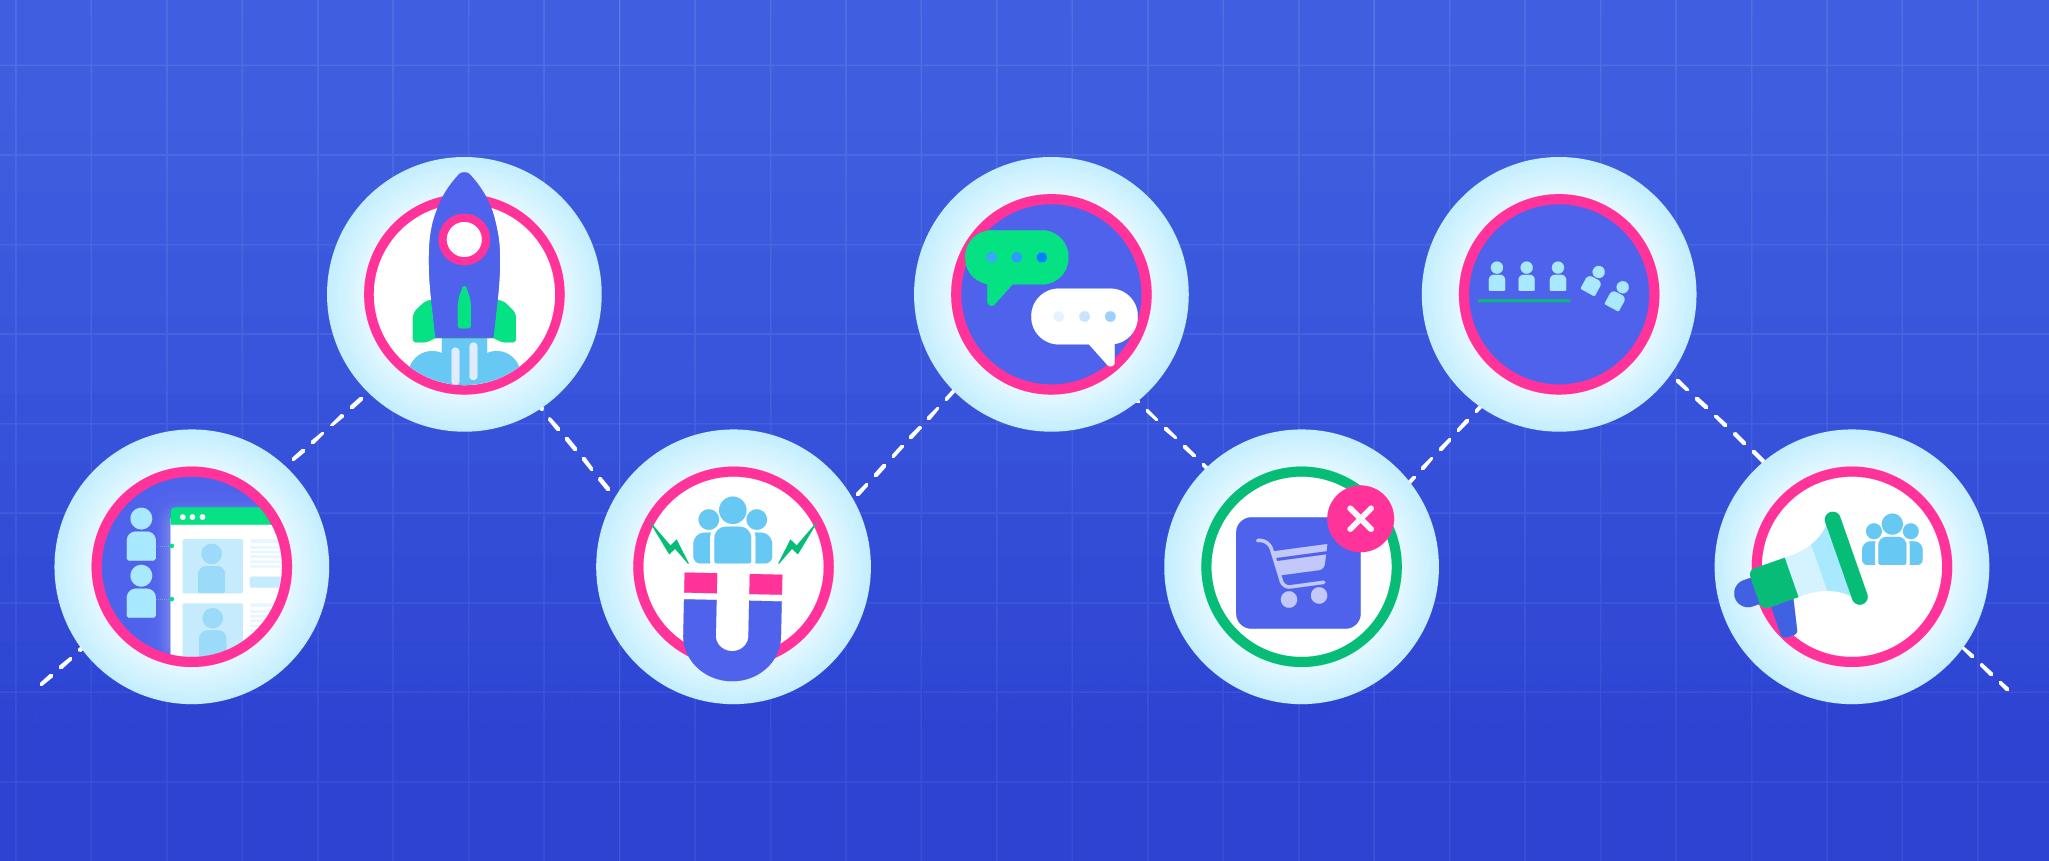 The 7 Key Mobile App Metrics You Should Track